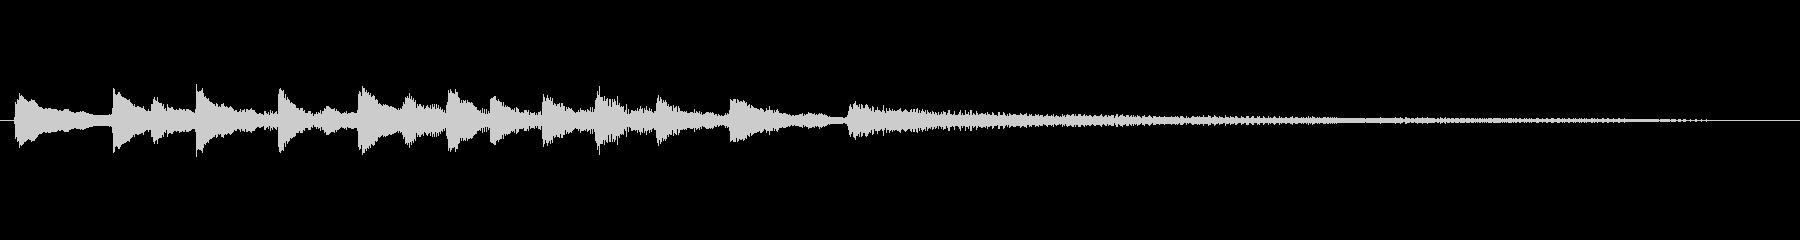 Dialogue5の未再生の波形